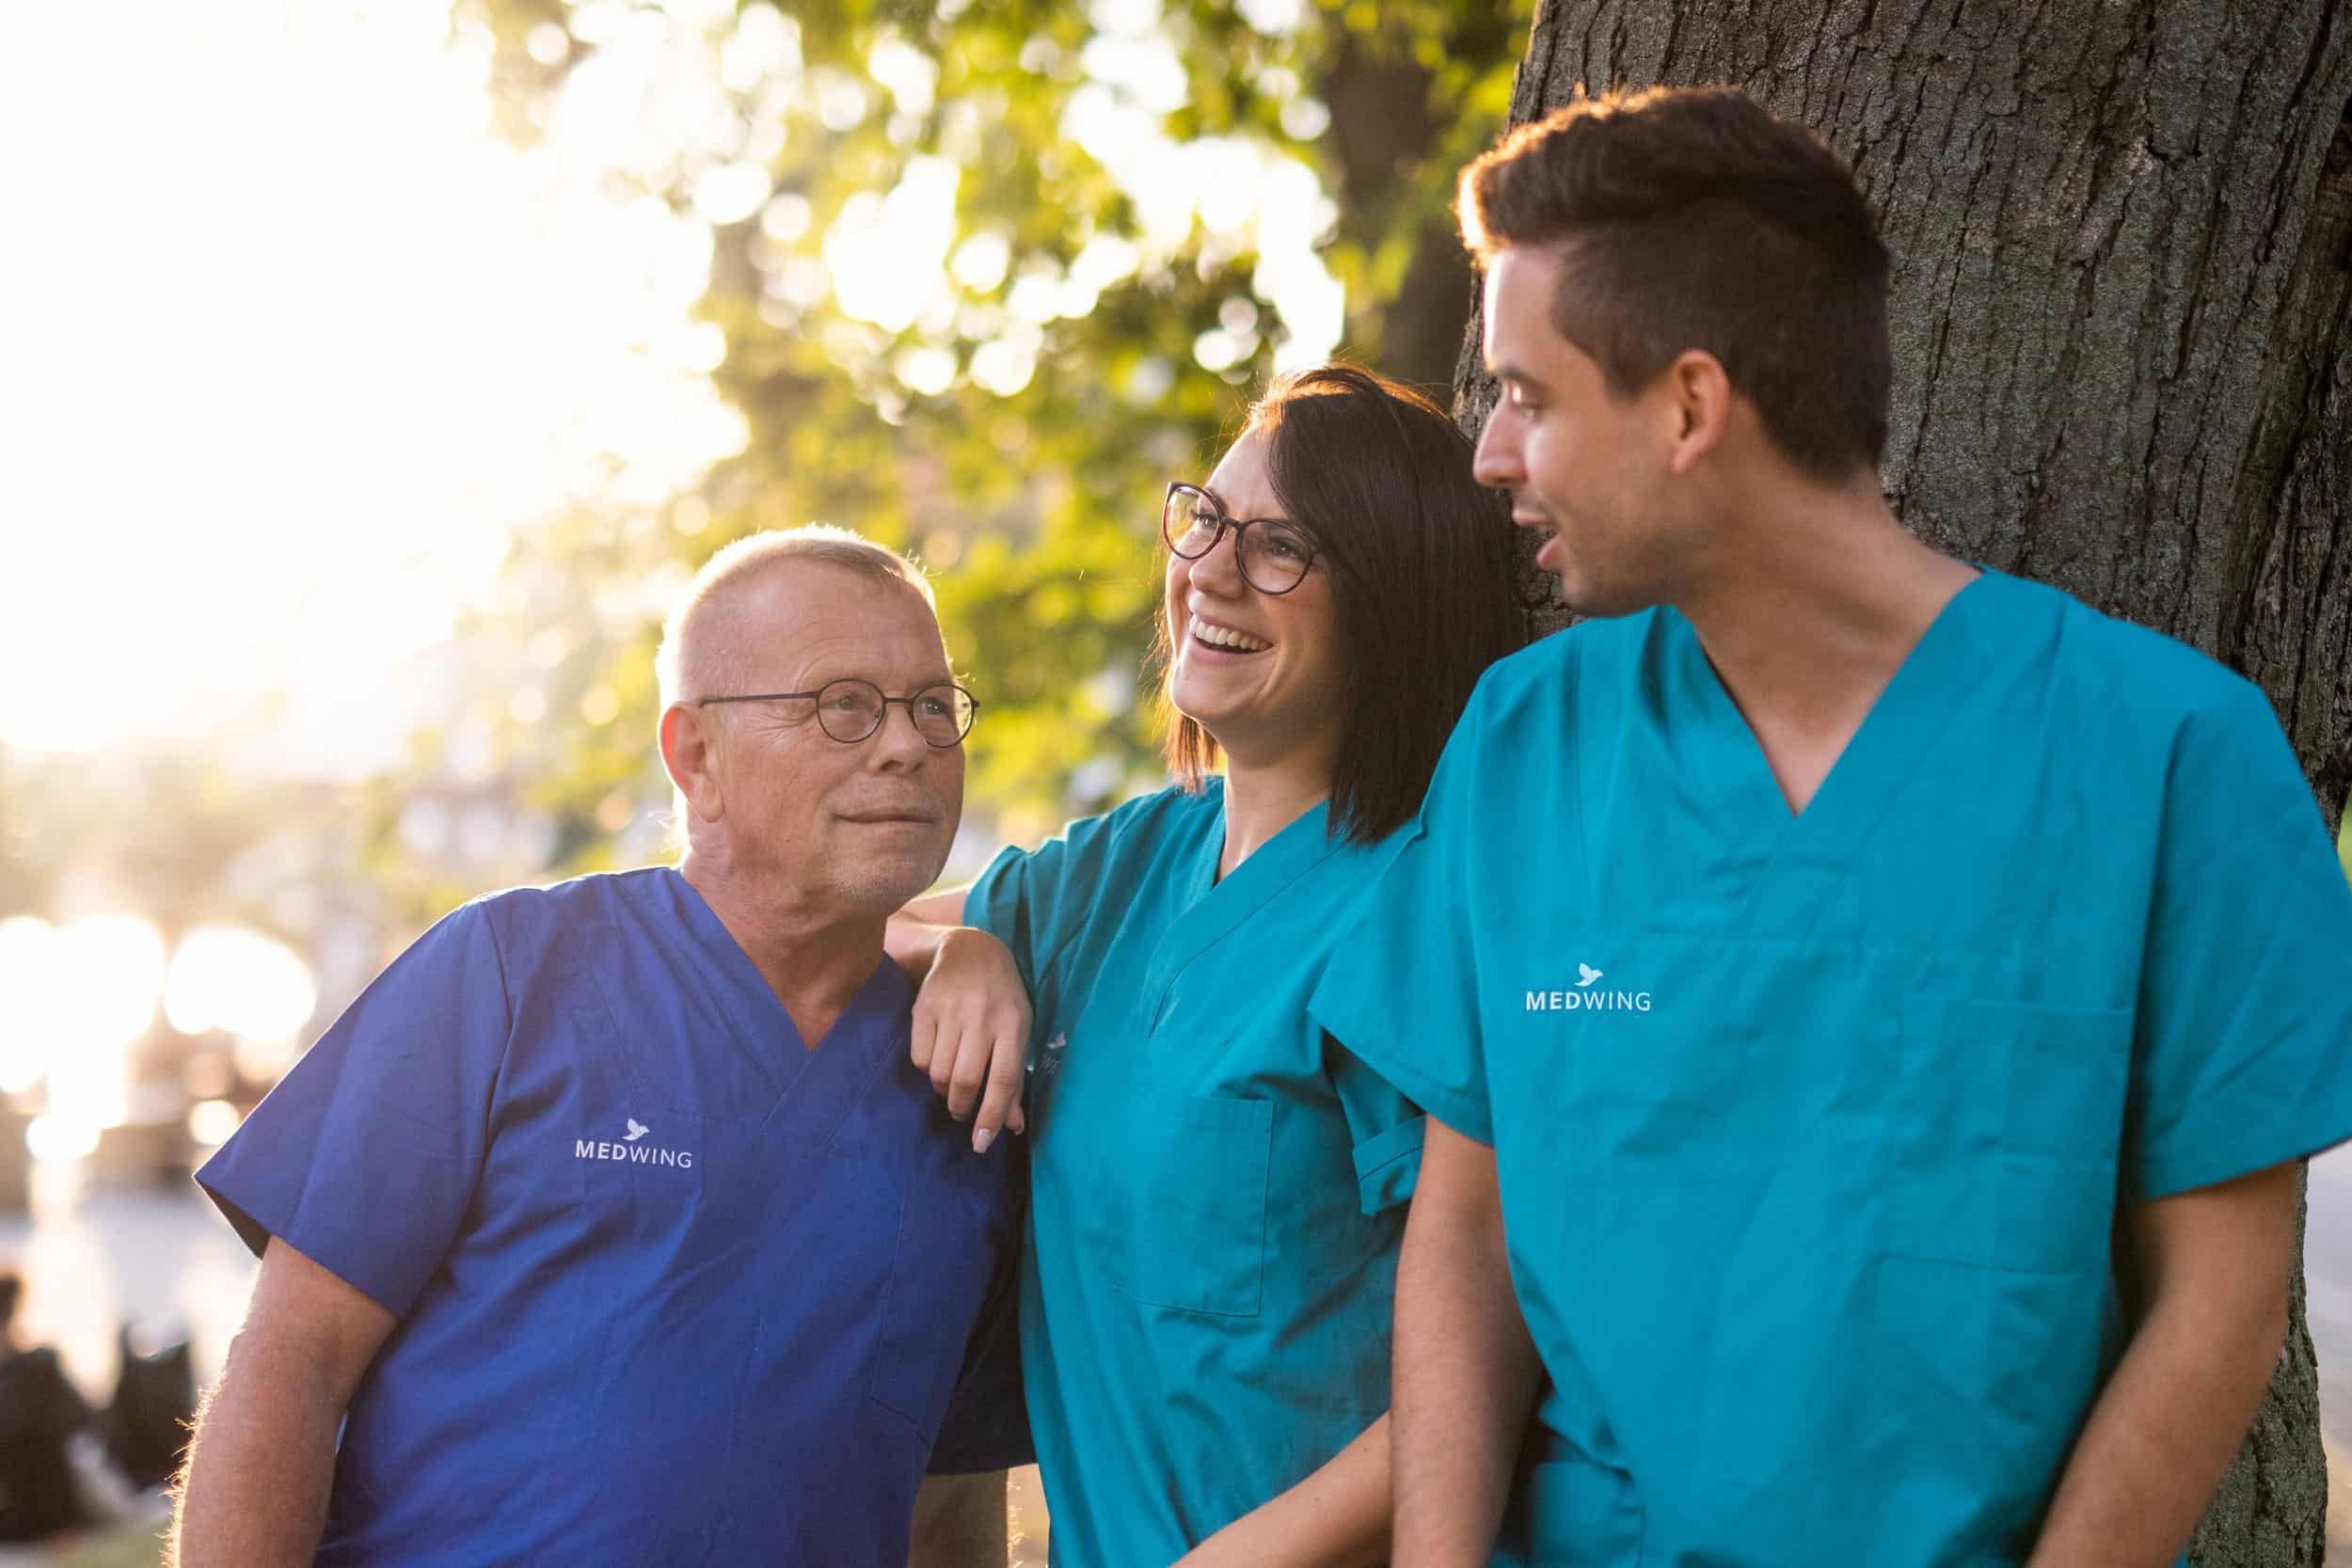 Nurses with dream job